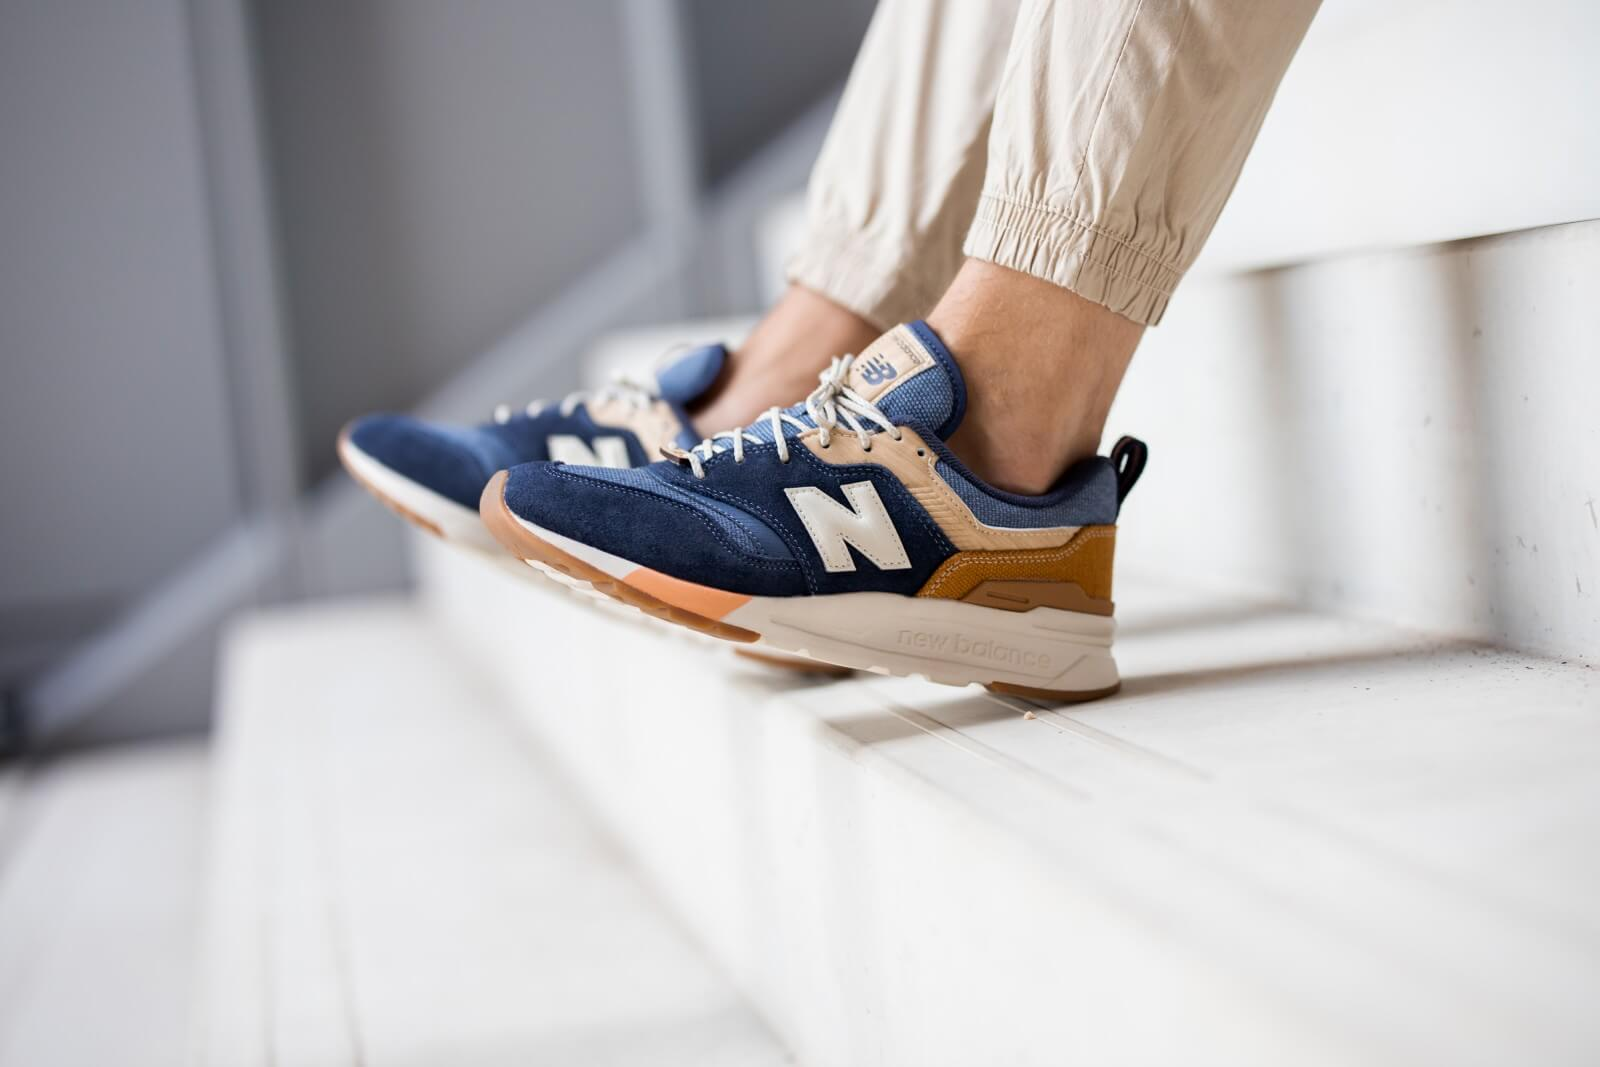 new balance 997hak